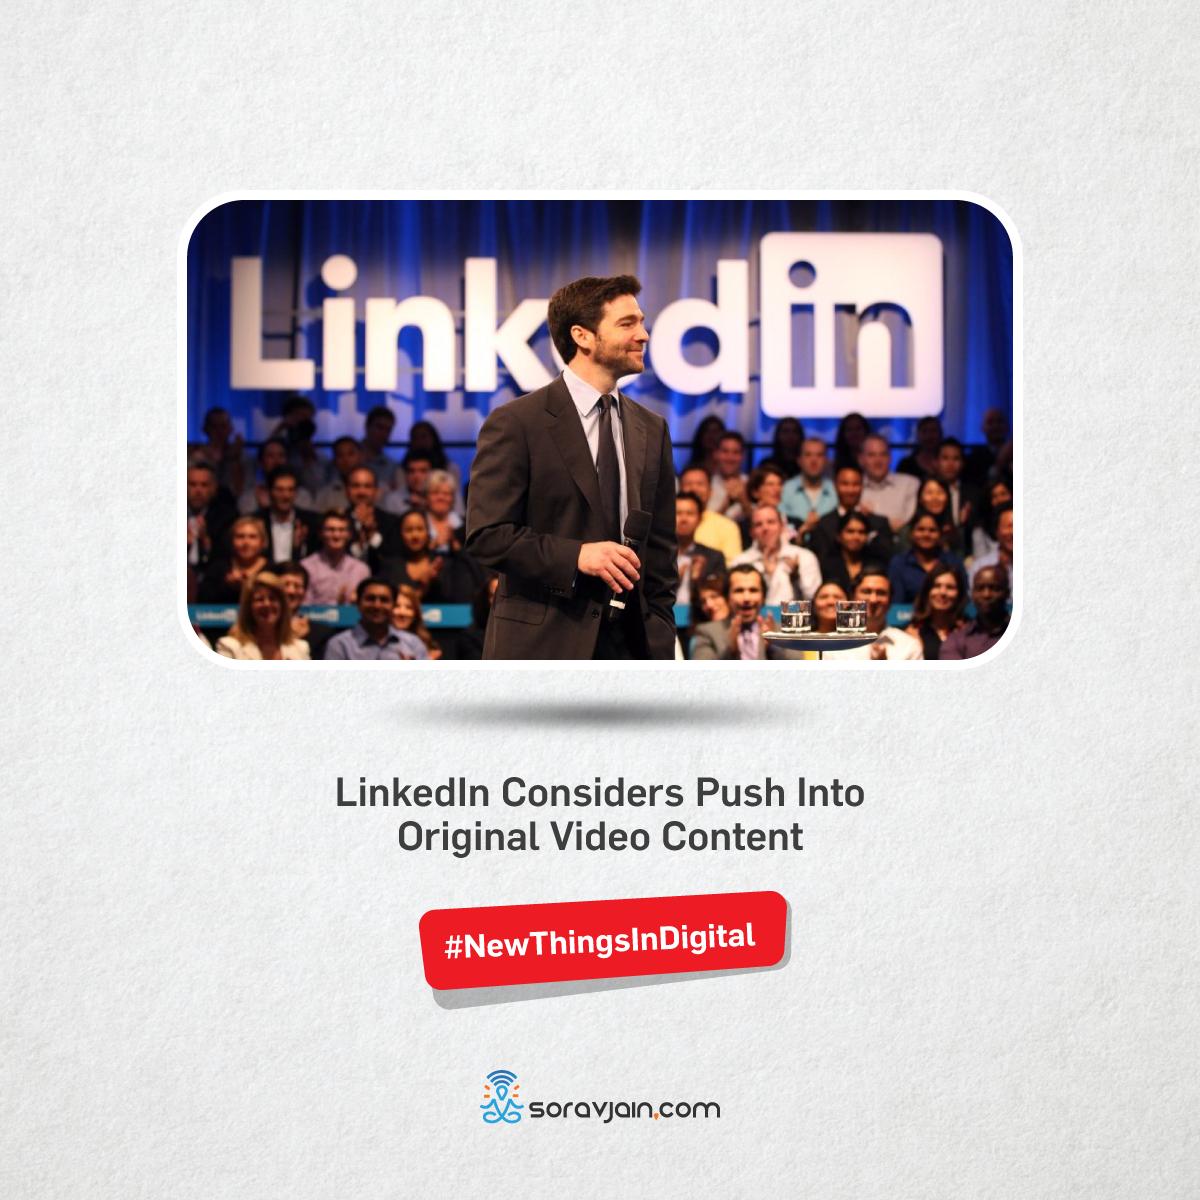 LinkedIn Considers Push Into Original Video Content